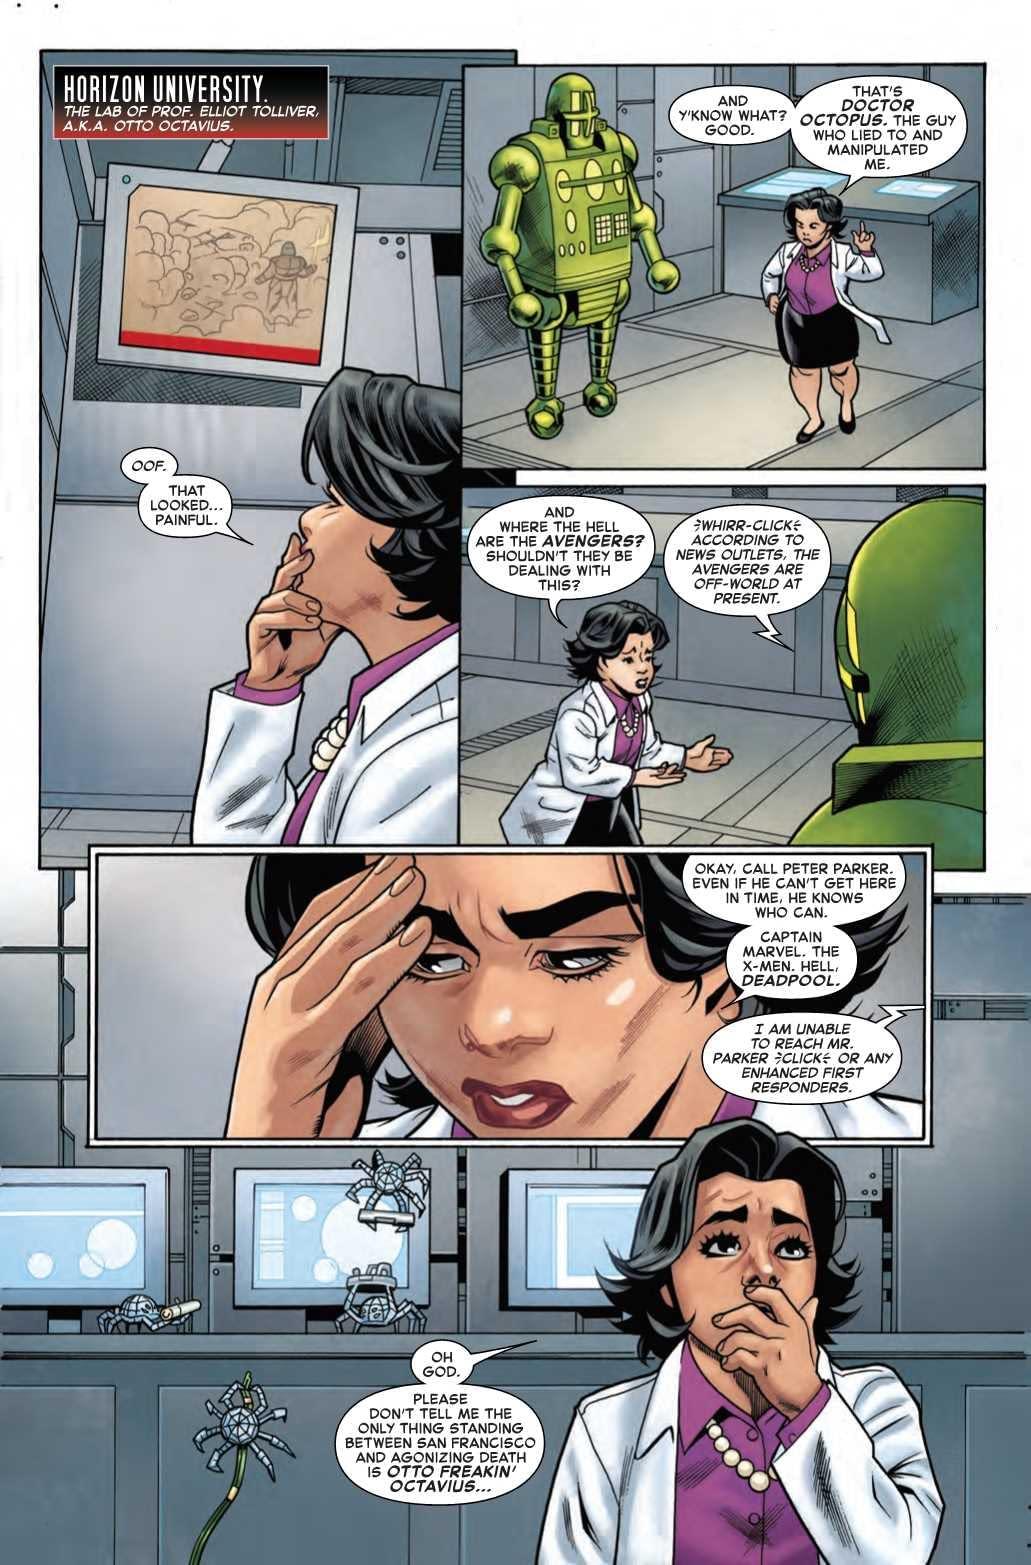 Thanks, Continuity Bot! Next Week's Superior Spider-Man #2